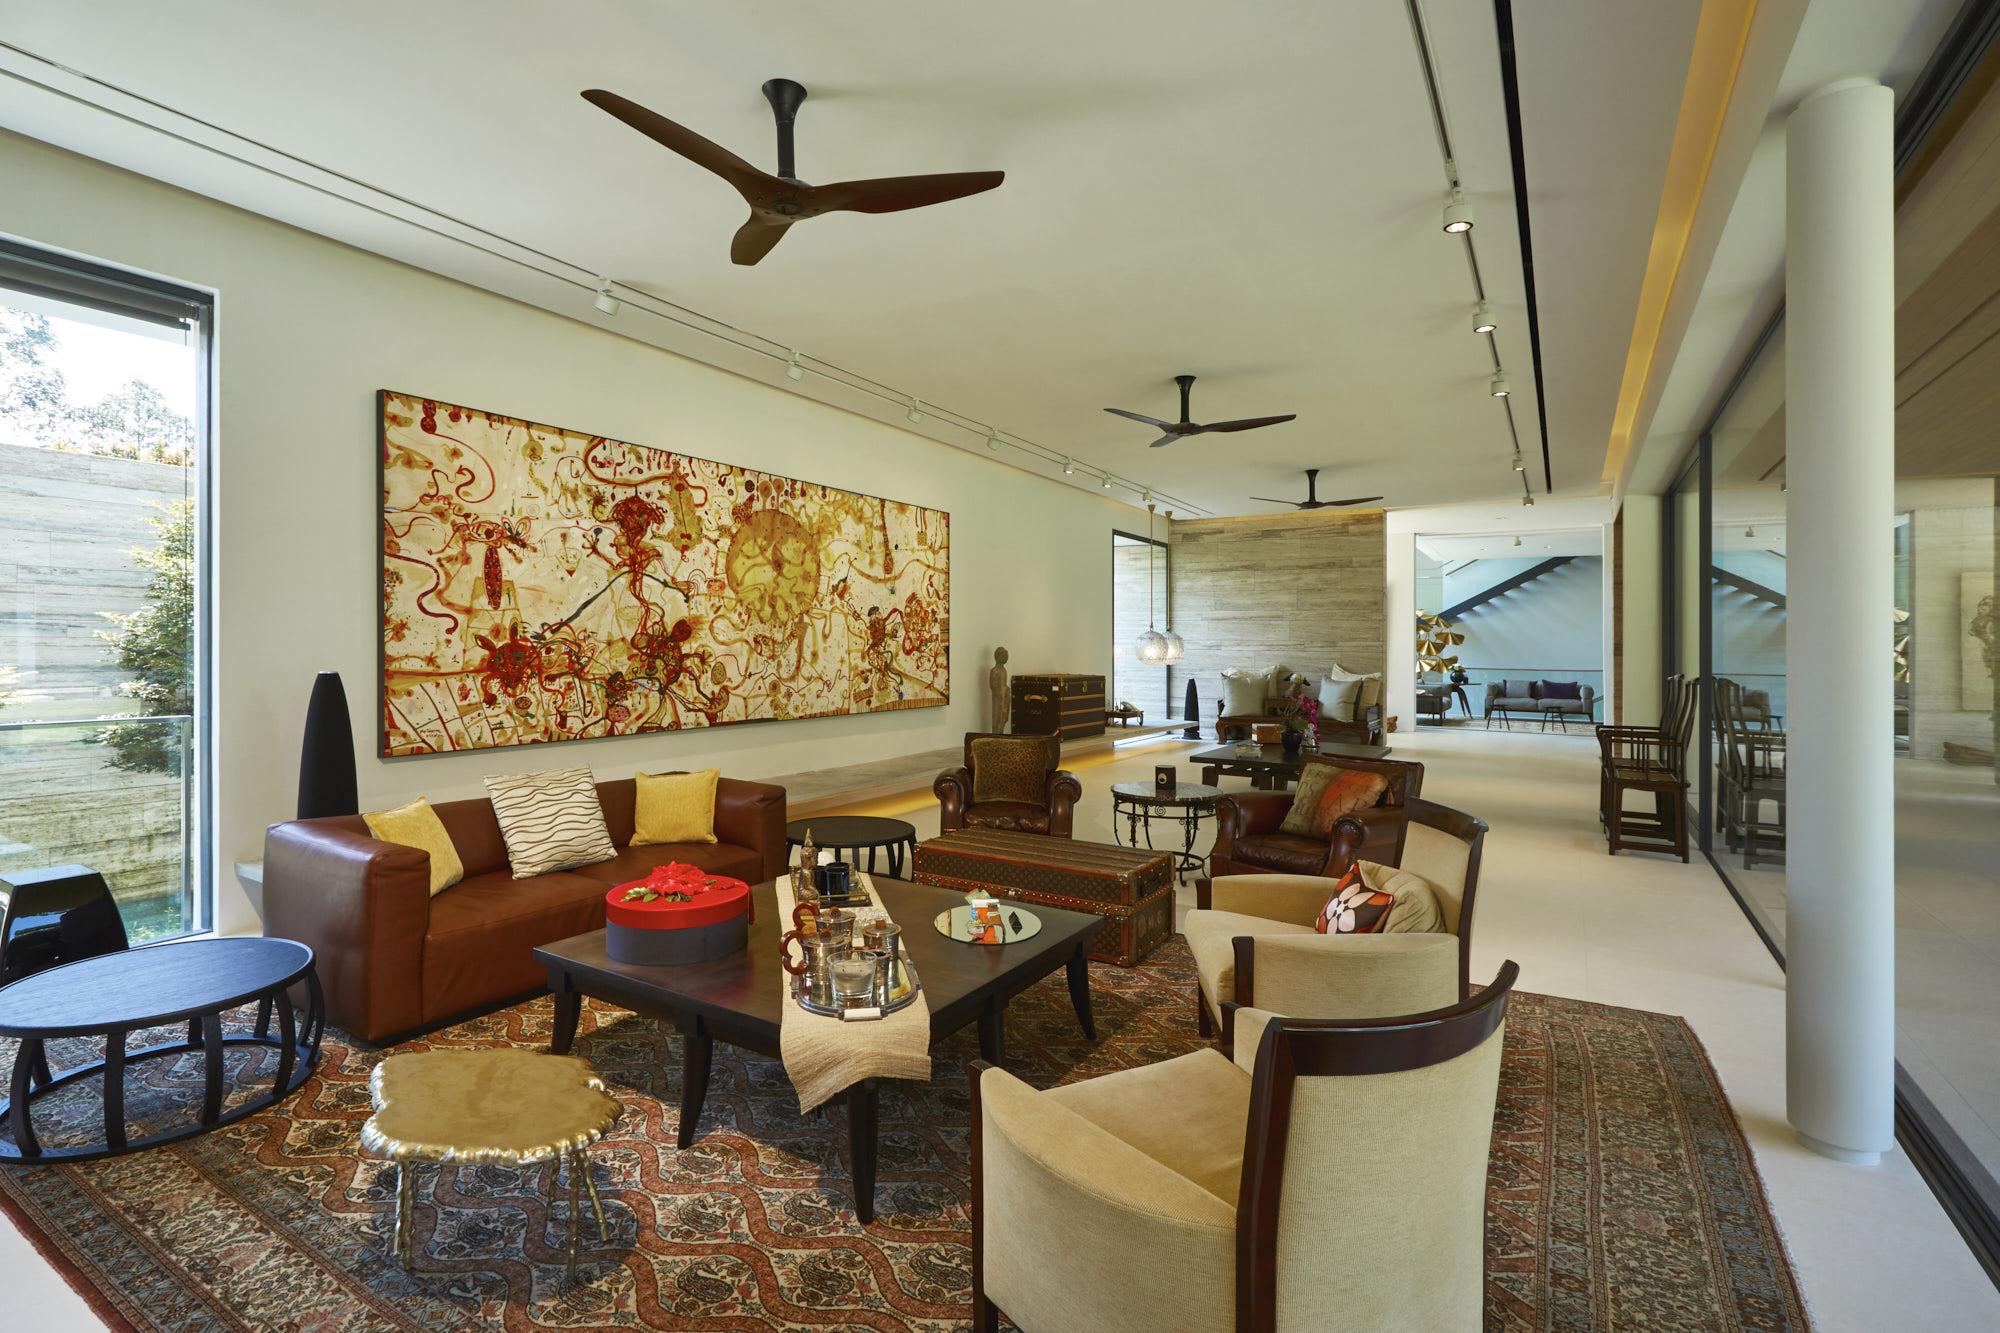 Nassim_Living Room_321_Final.jpg